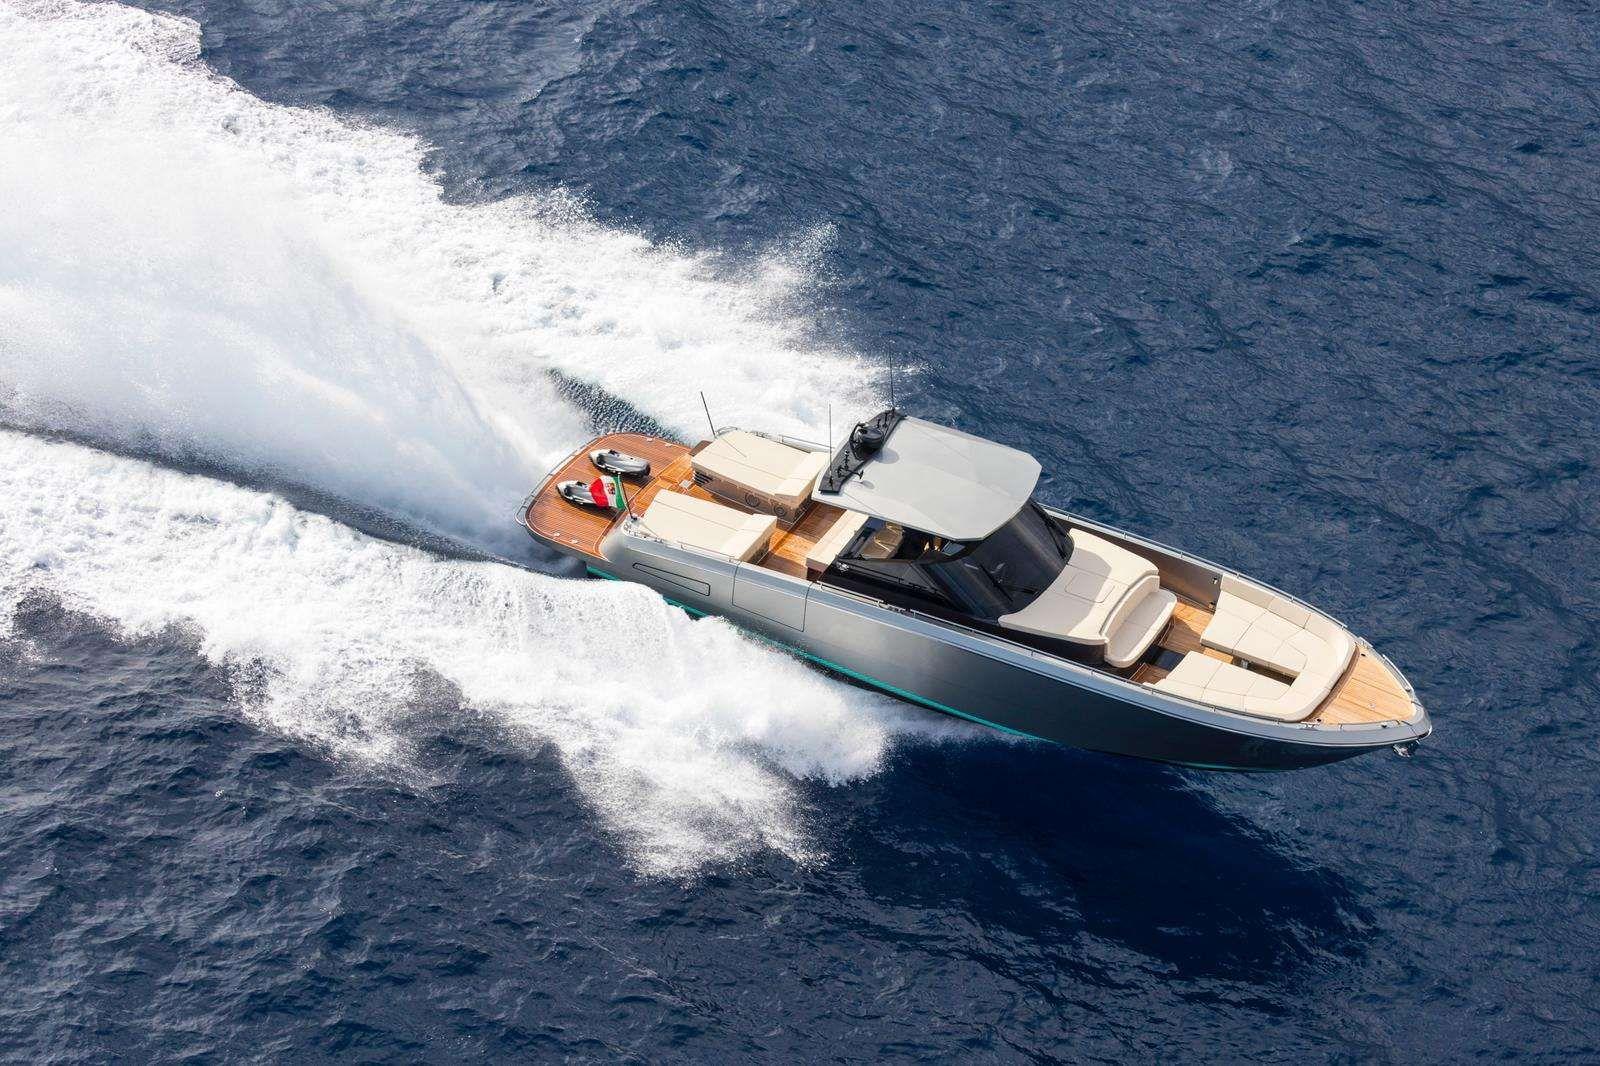 JANINA - Cantieri Navali Continental 57 - 2 Cabins - Miami